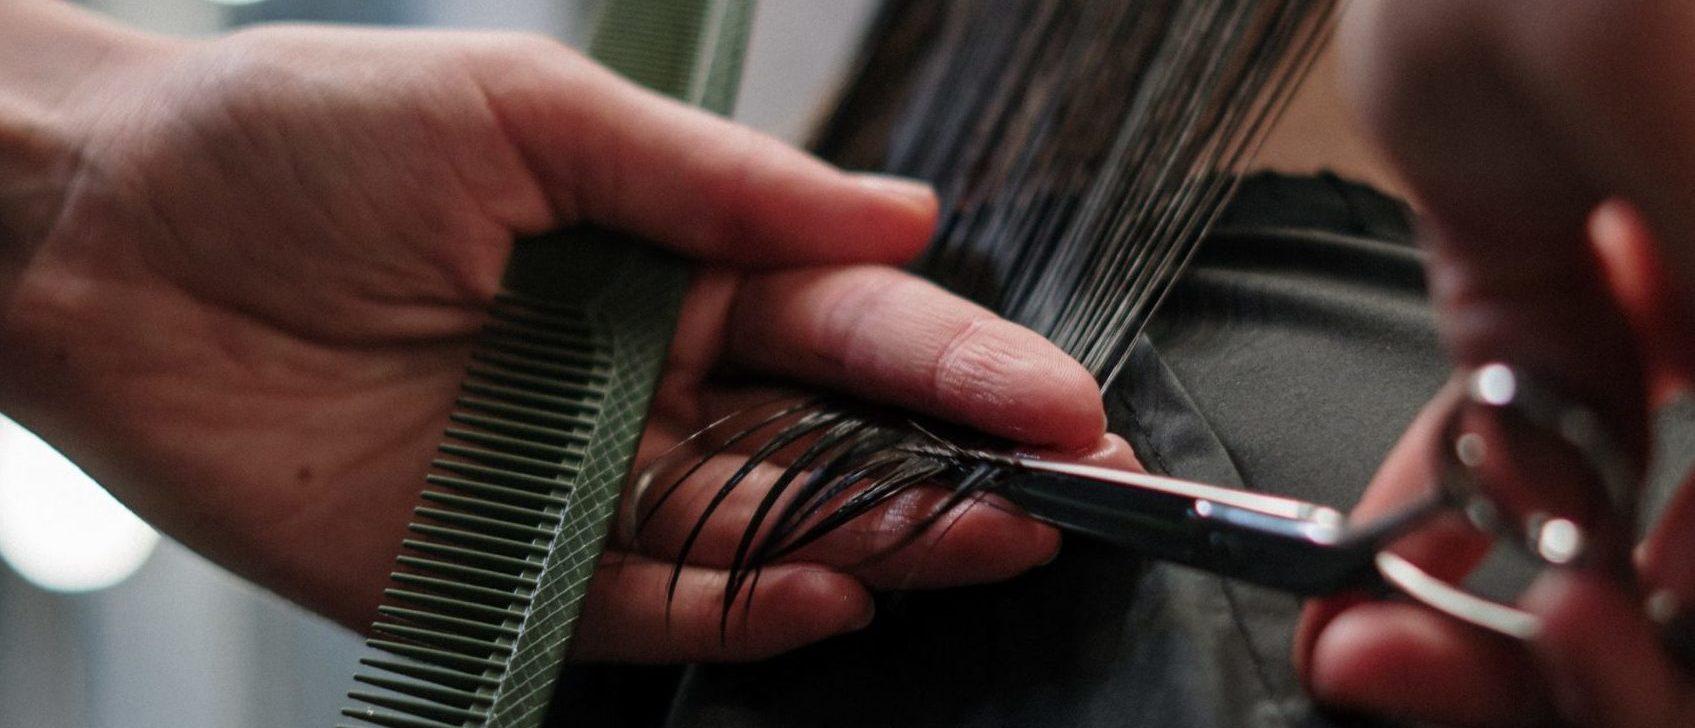 Haareschneiden beim Friseur